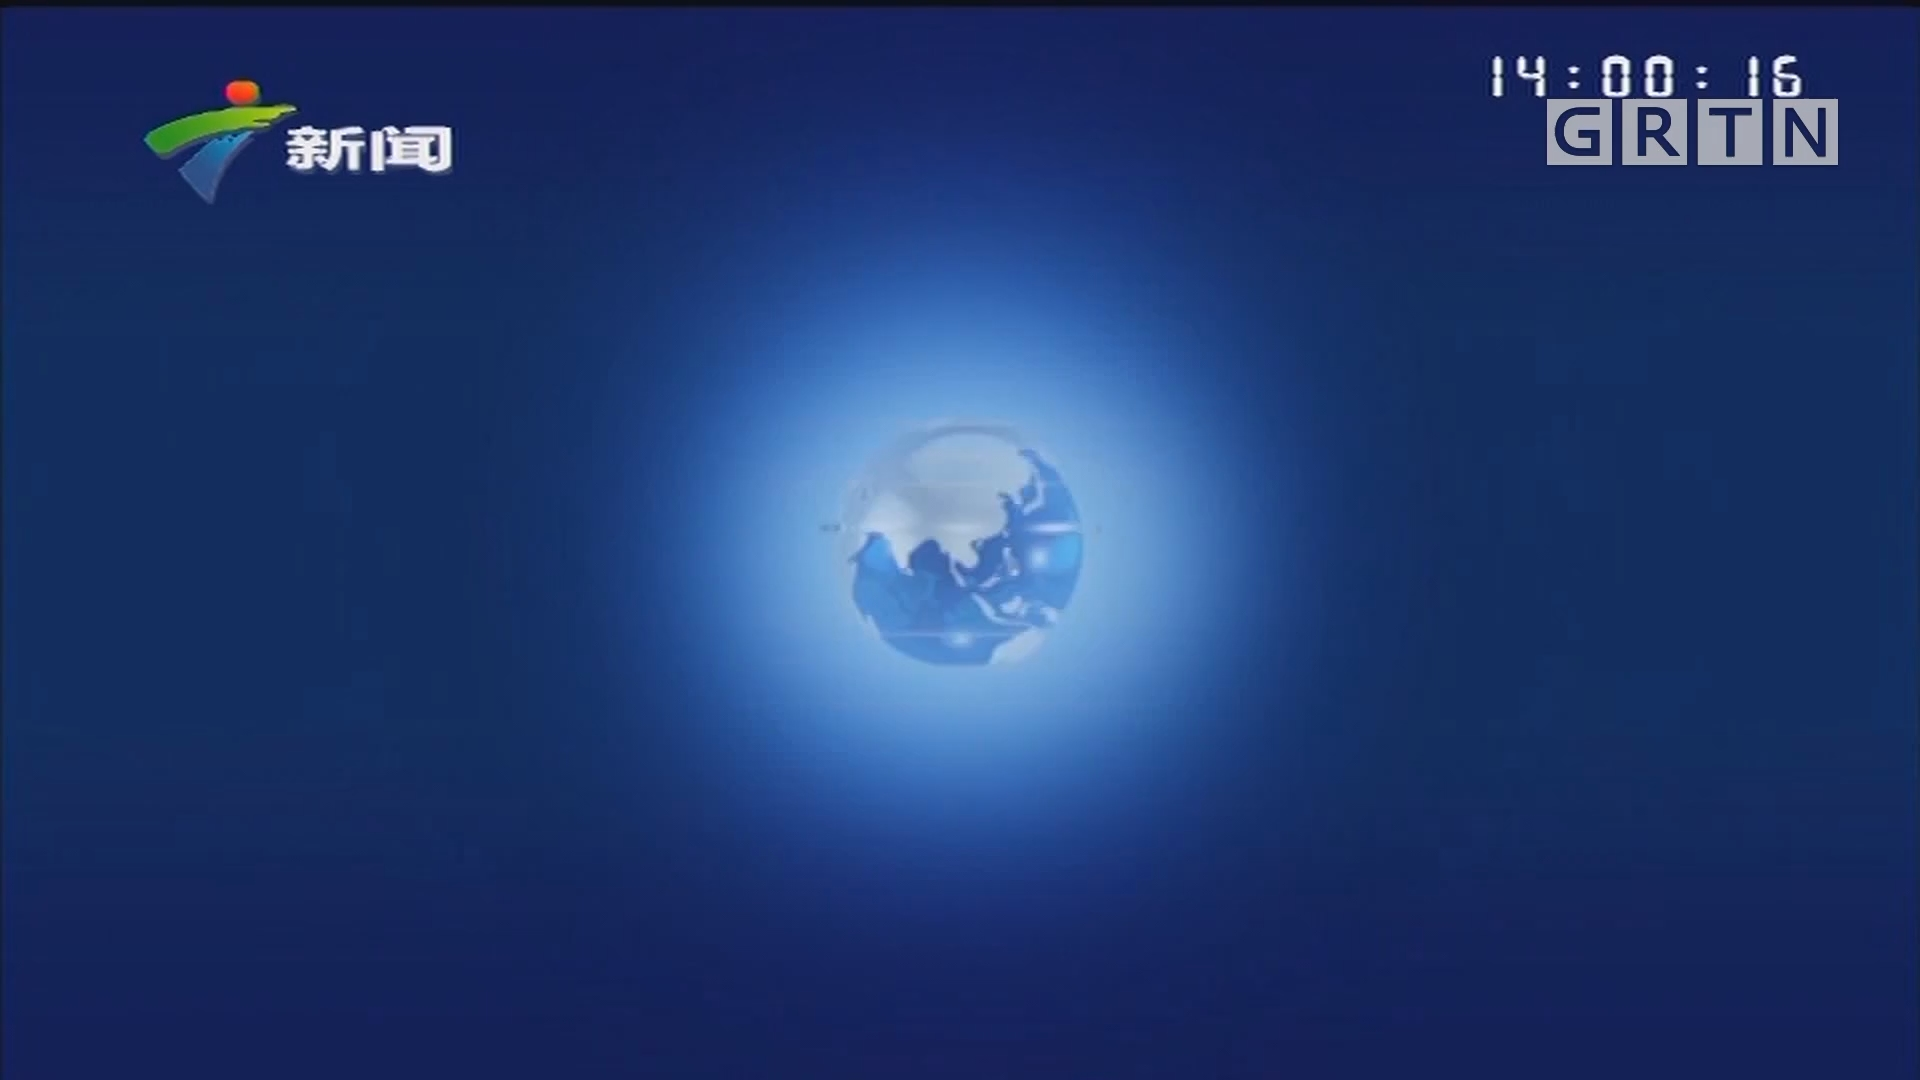 [HD][2019-10-30]正点播报:东莞 一泡沫制品厂突发火灾 消防紧张扑救